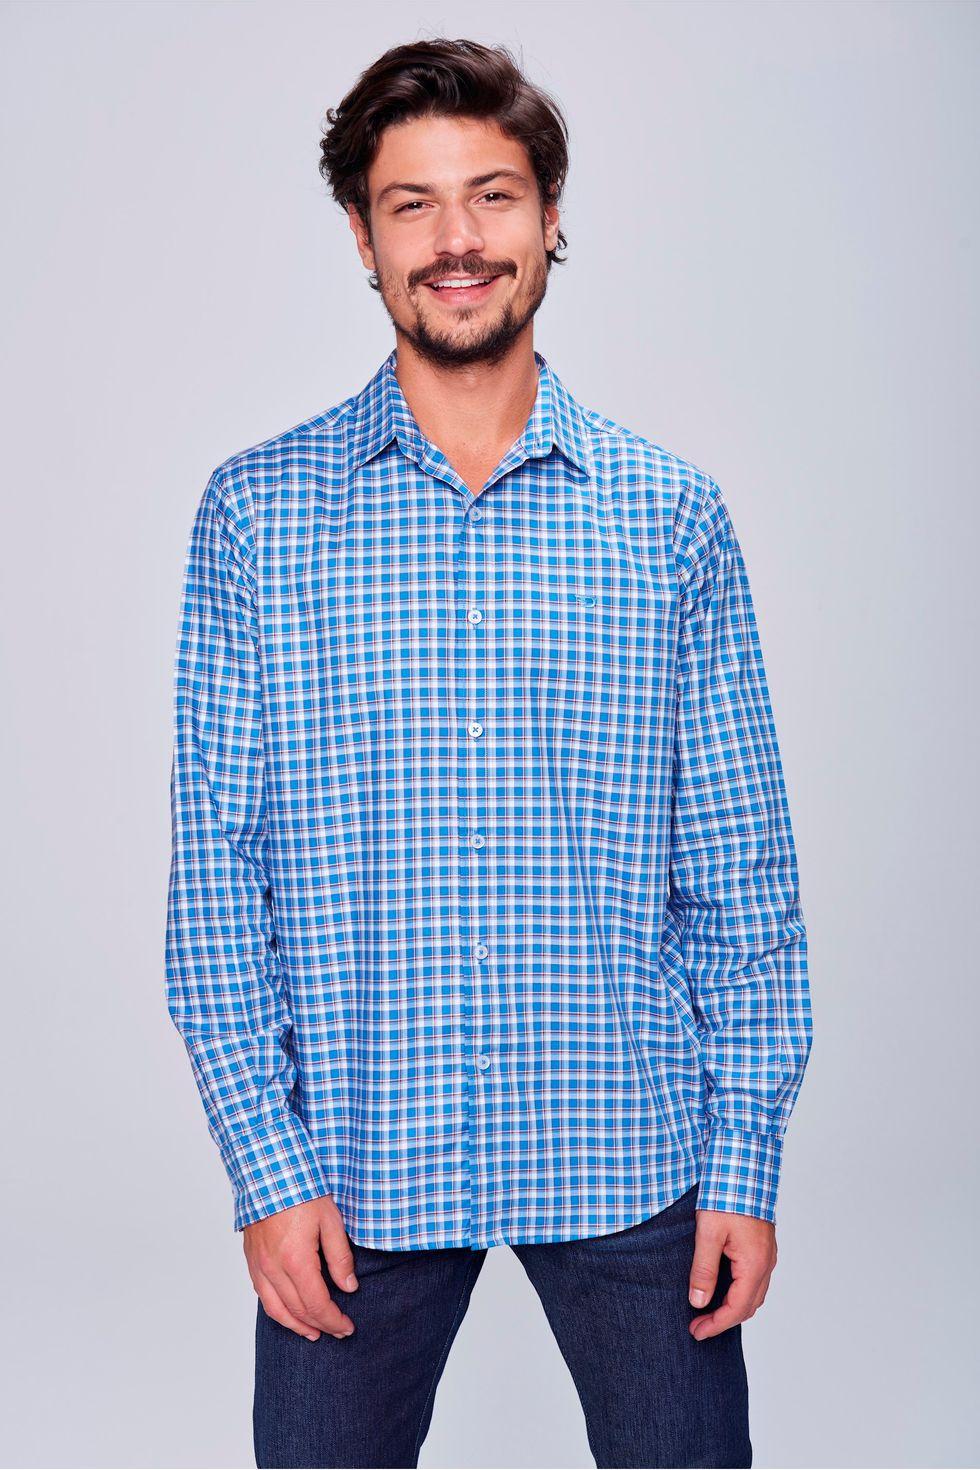 Camisa-Social-Xadrez-de-Algodao-Peruano-Frente--